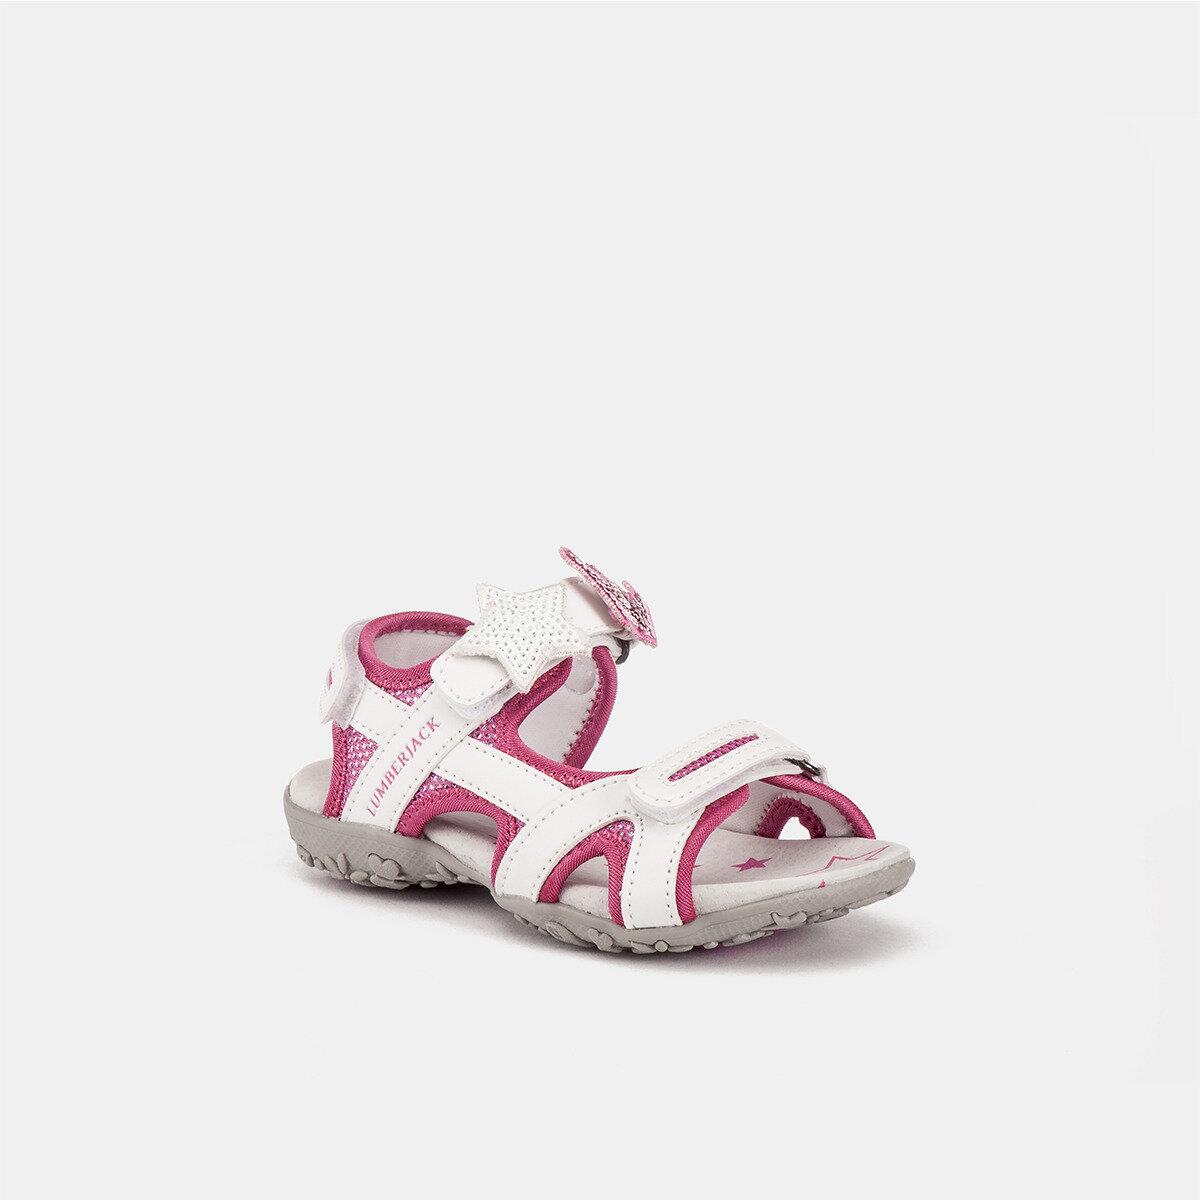 LINDA WHITE/FUXIA Girl Sandals